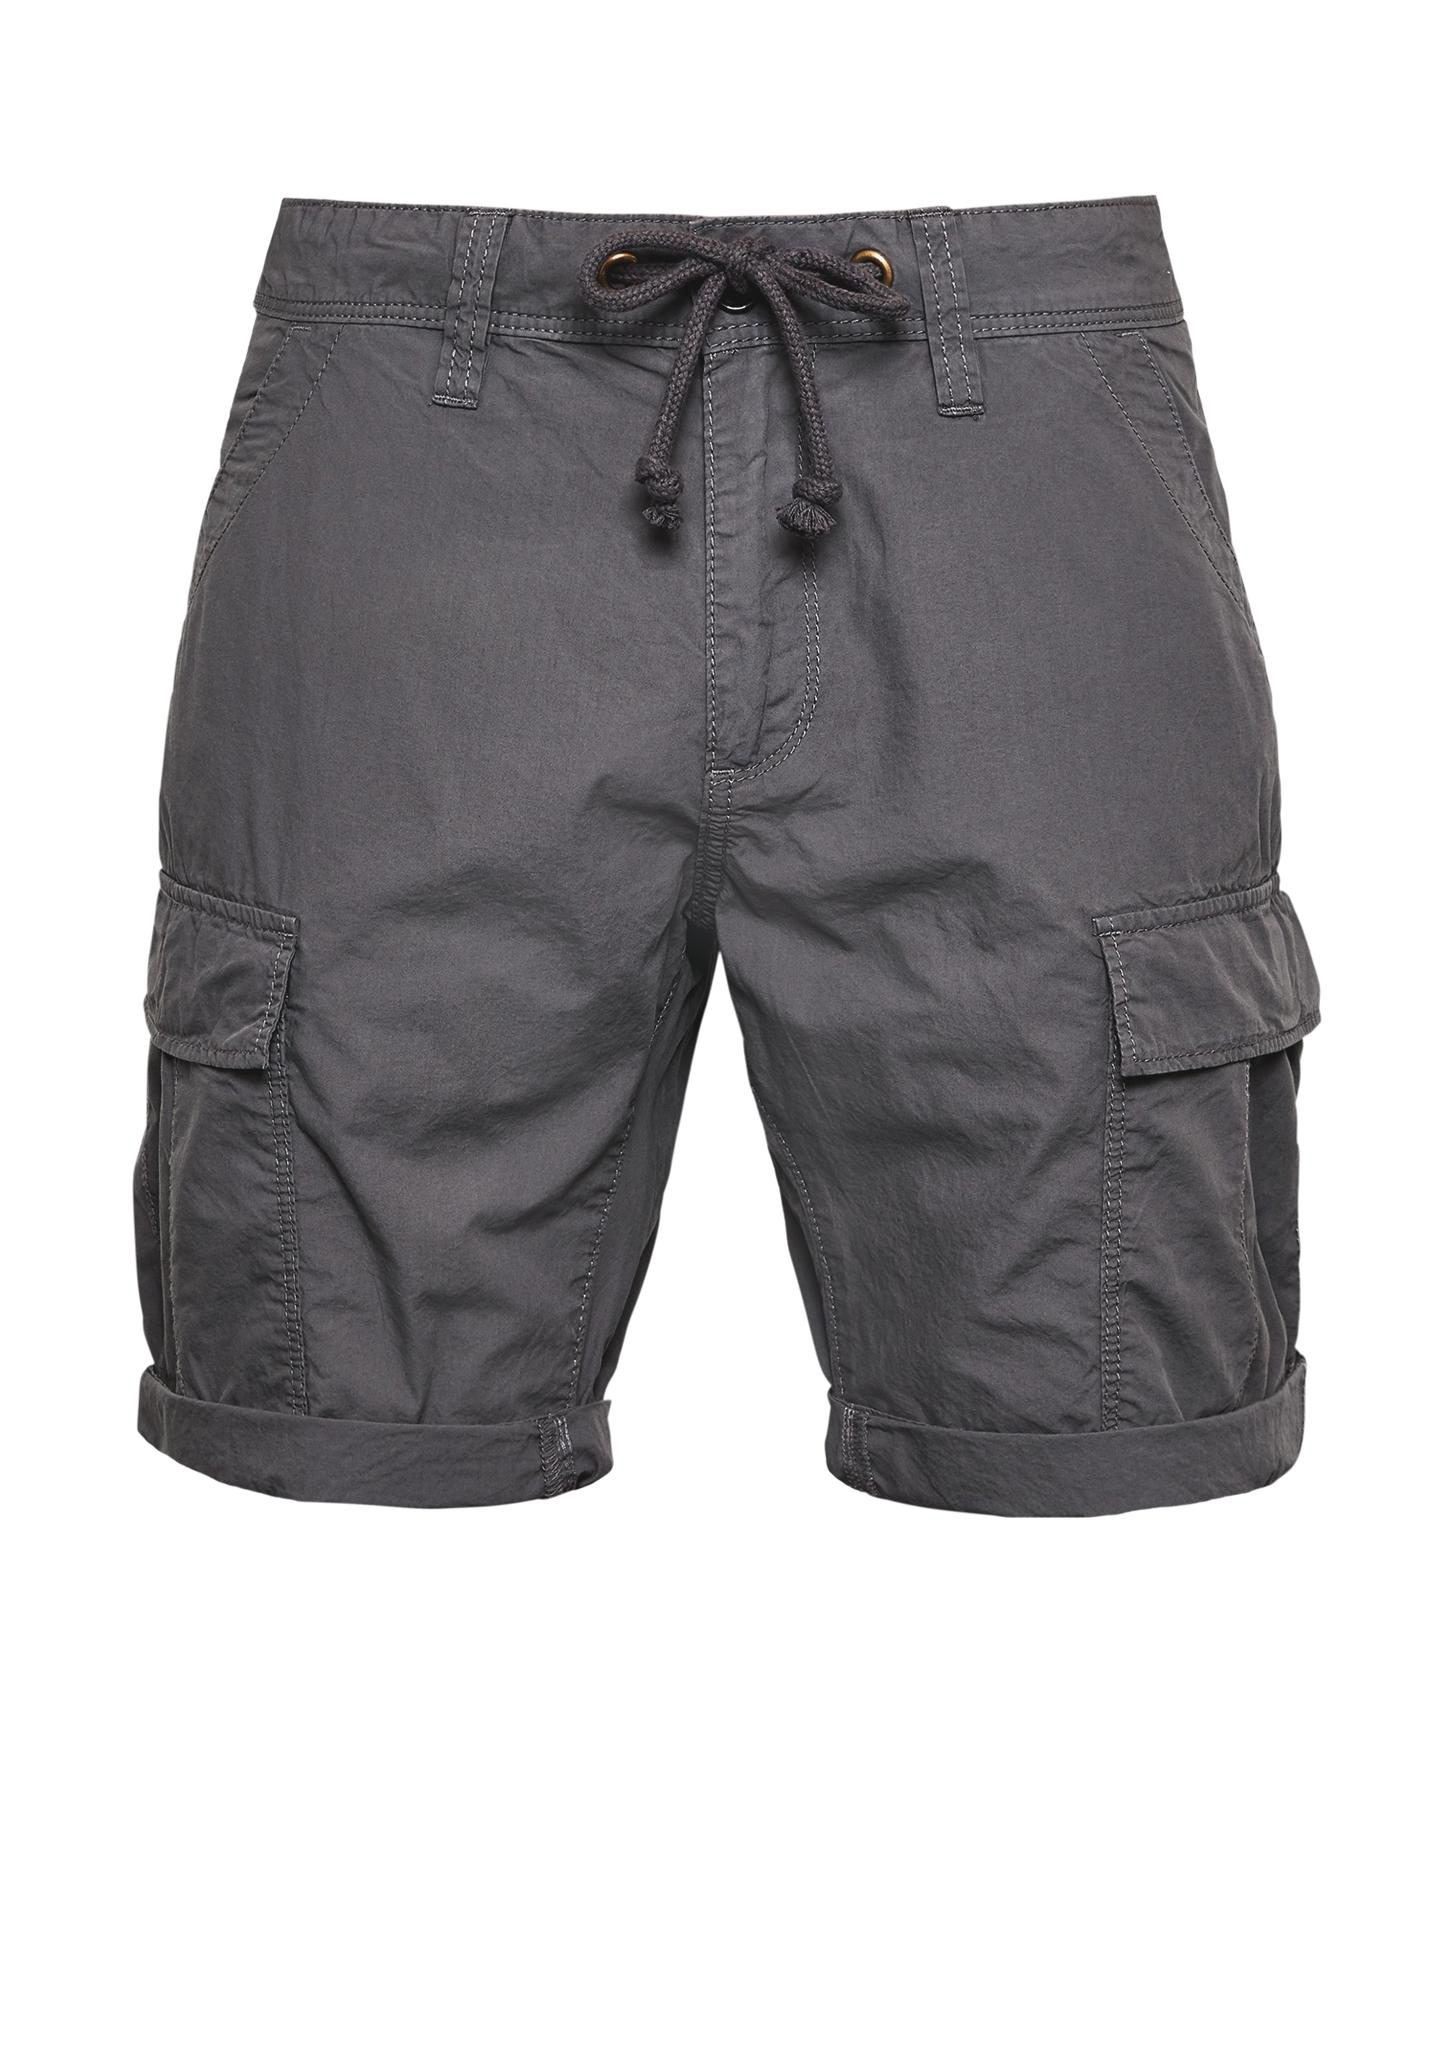 Bermuda | Bekleidung > Shorts & Bermudas | Grau | 100% baumwolle | Q/S designed by